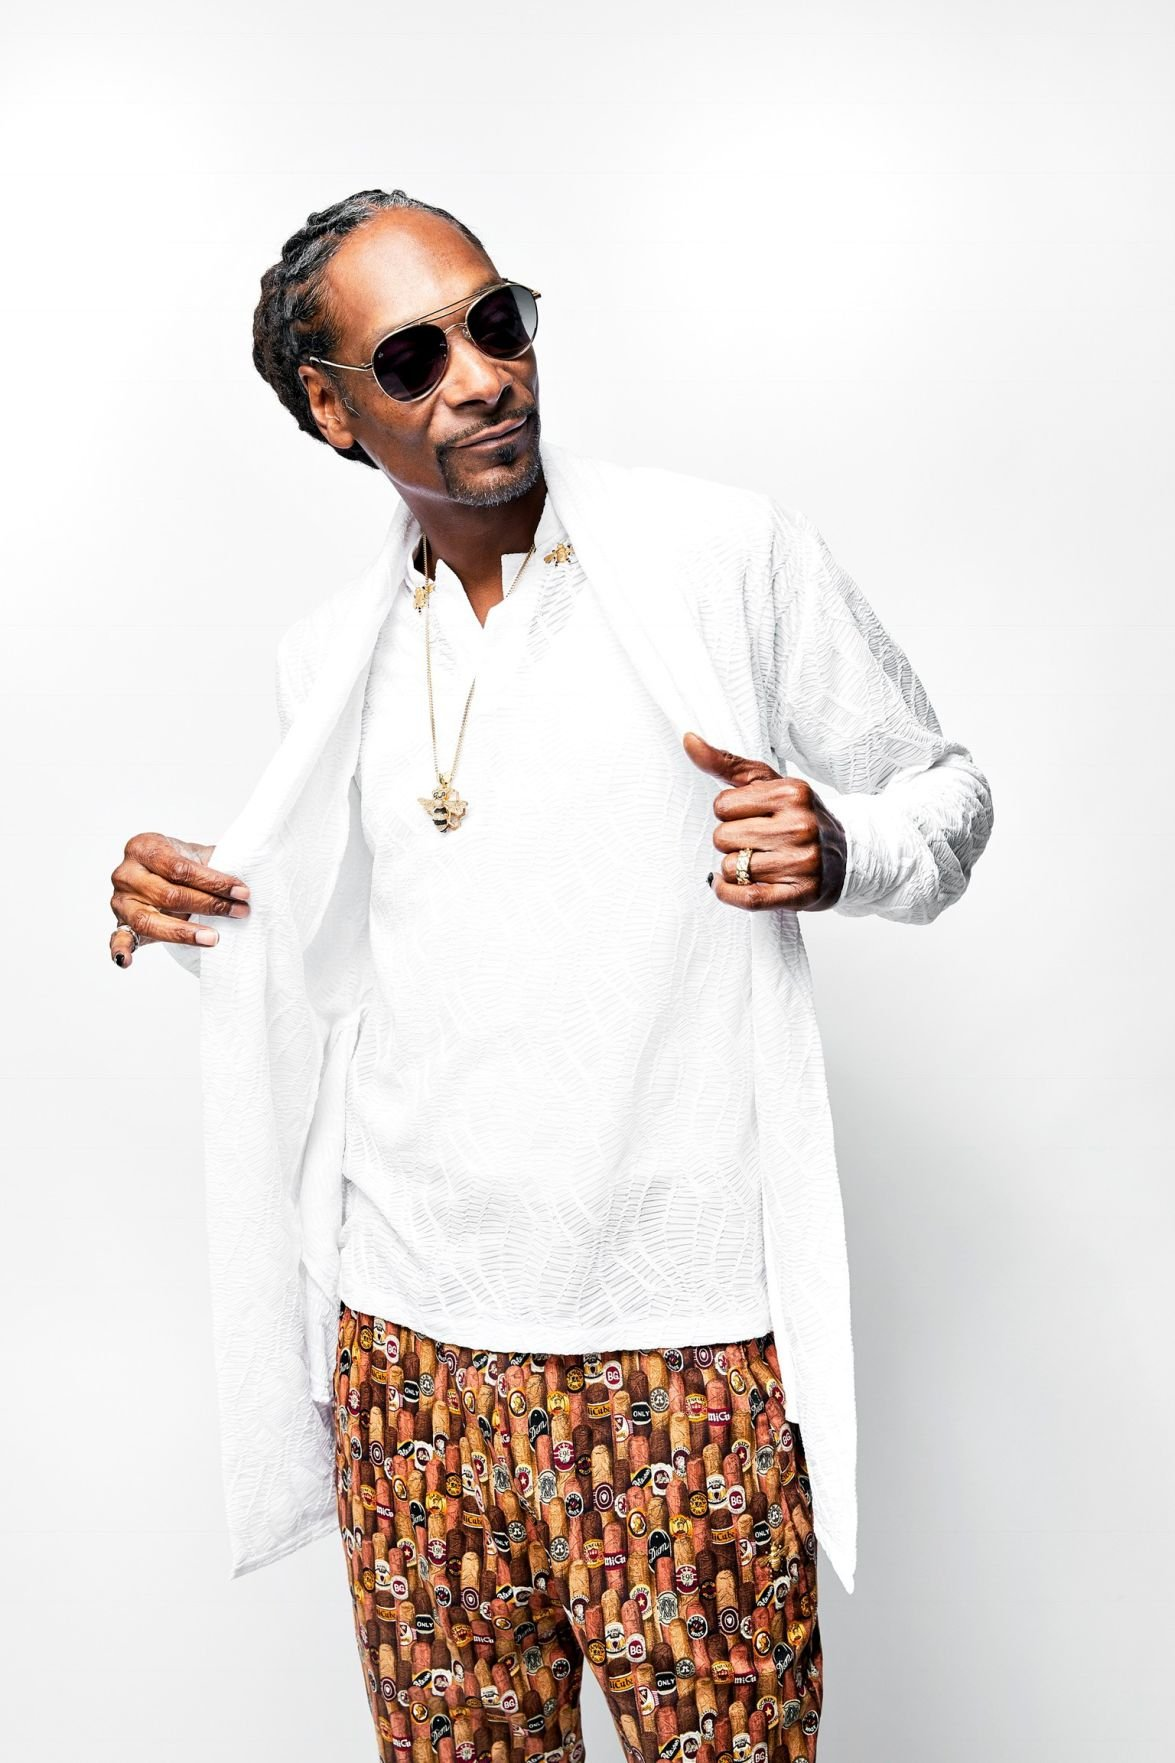 Snoop Dogg pic.jpg